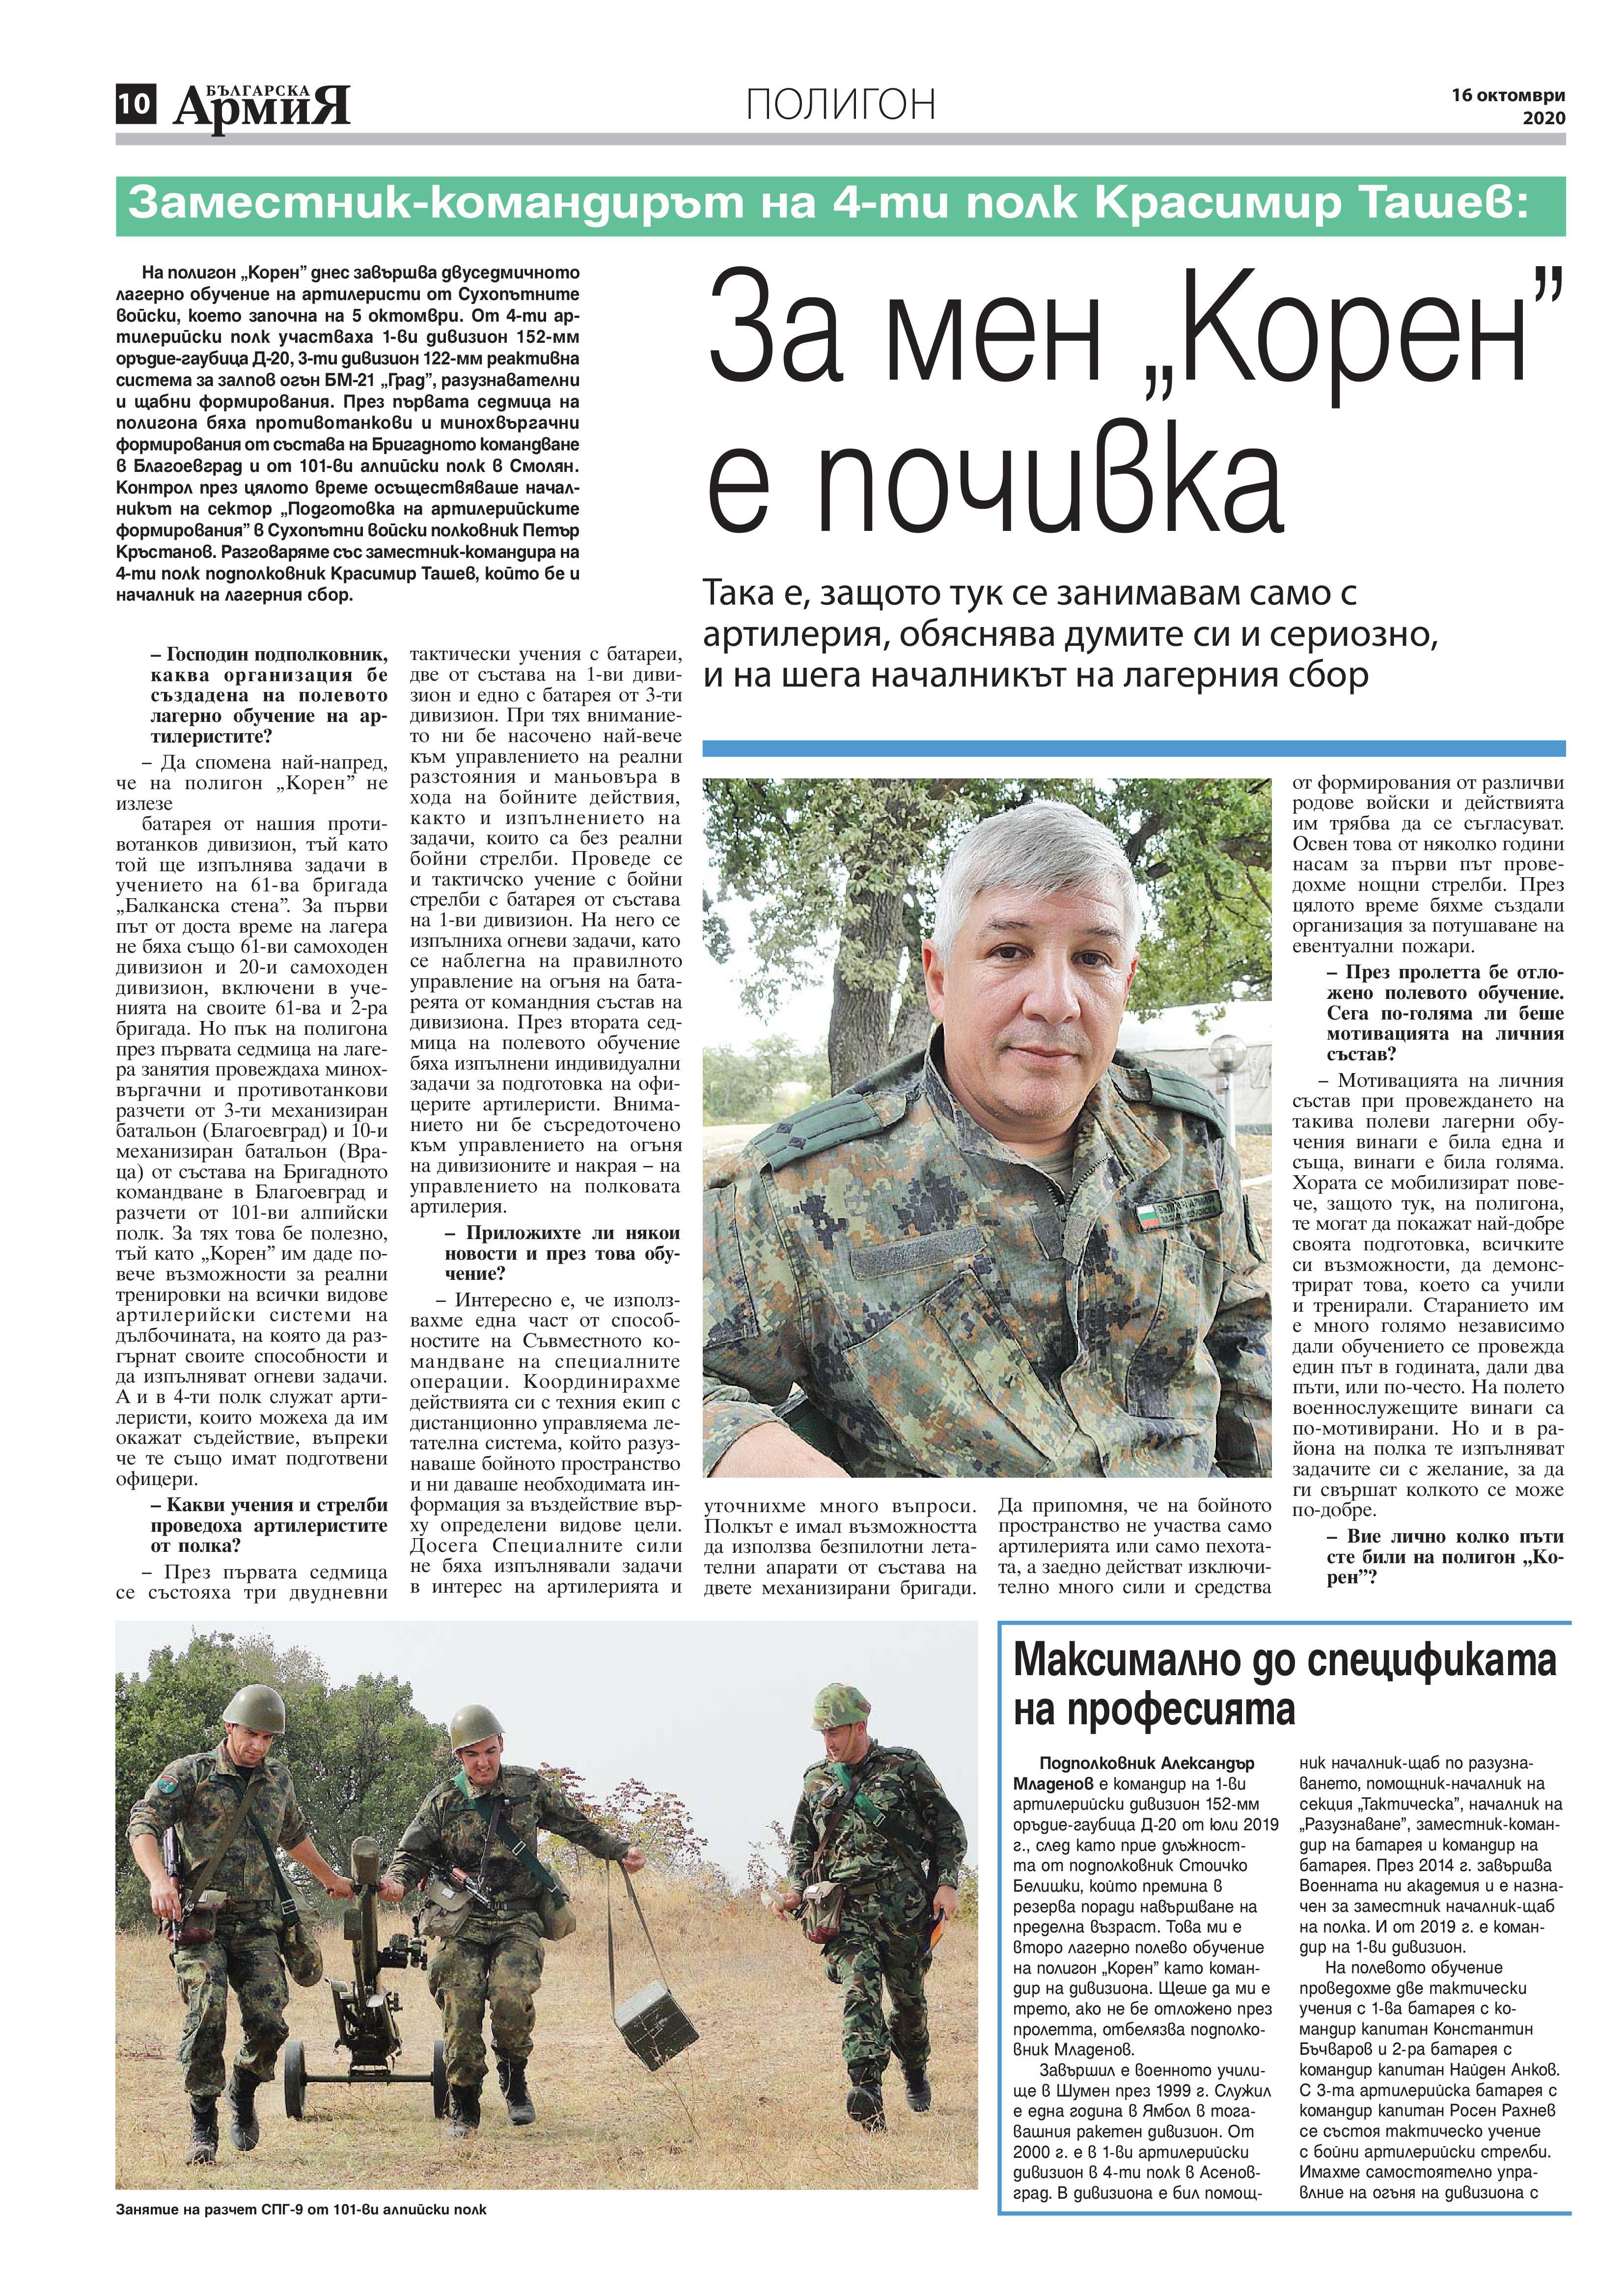 https://armymedia.bg/wp-content/uploads/2015/06/10-44.jpg